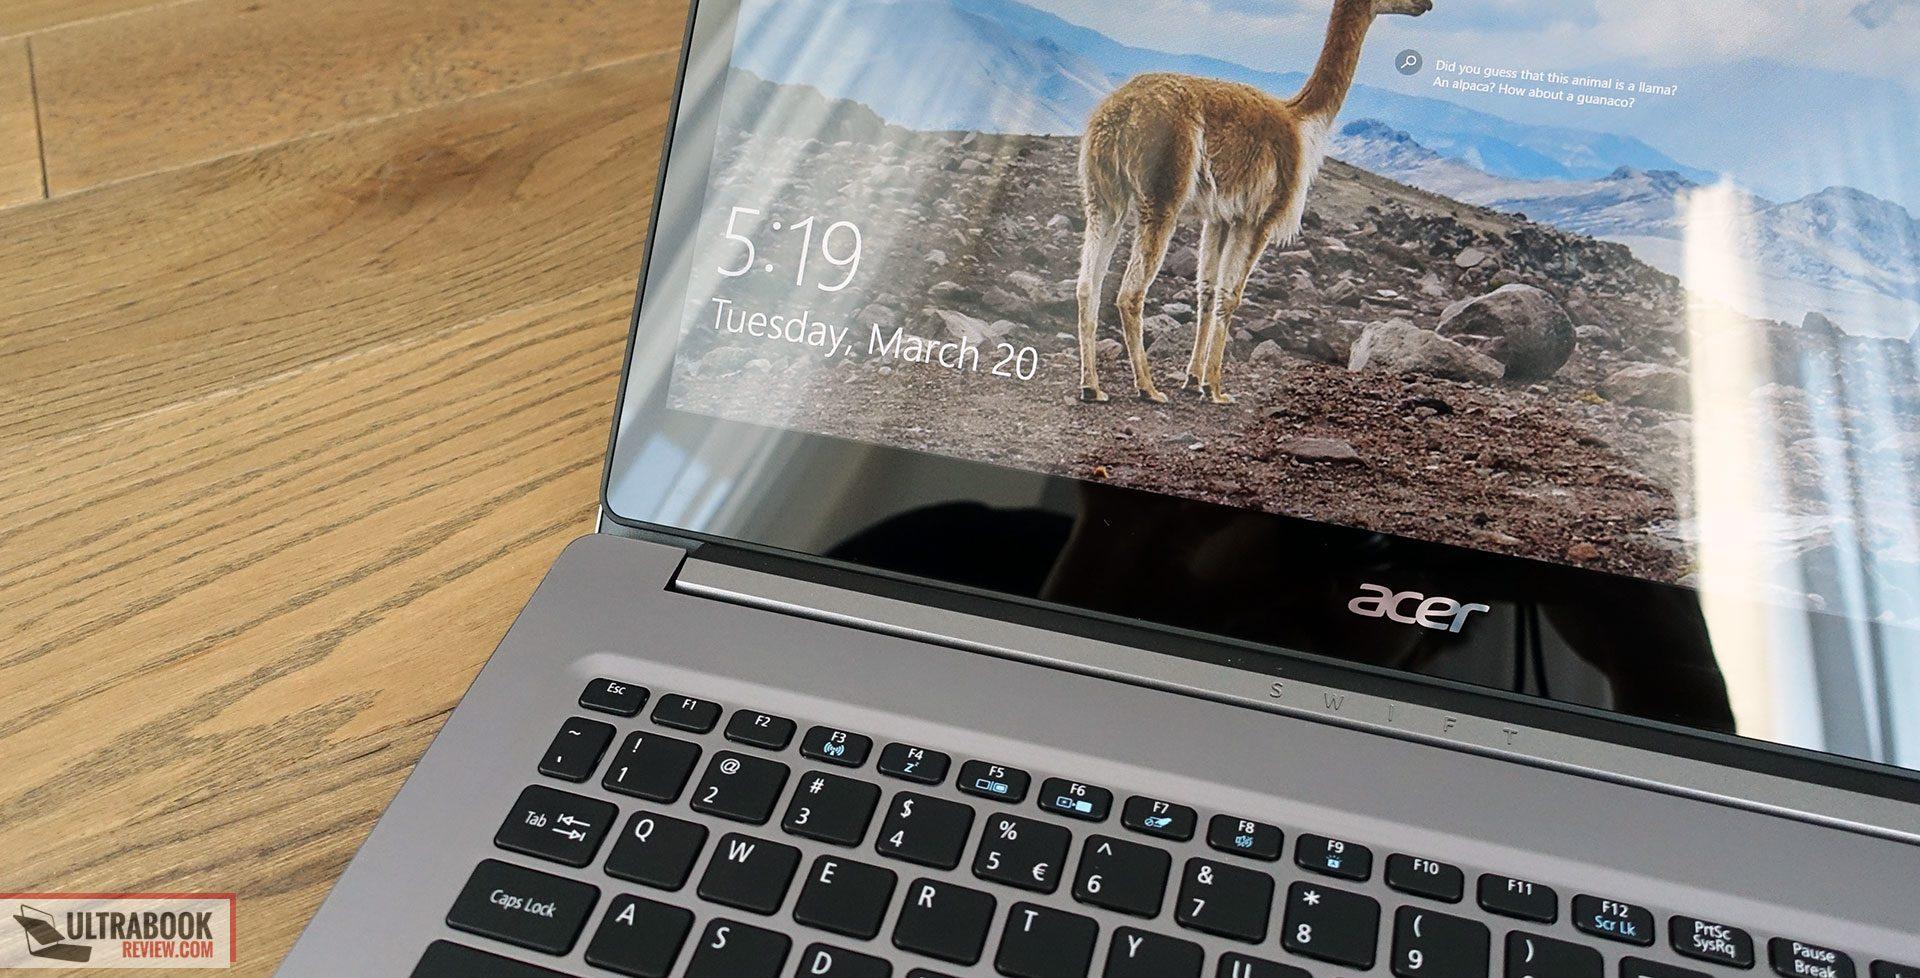 Acer Swift 3 SF315-41 review (AMD Ryzen 7 2700U APU, Radeon RX540